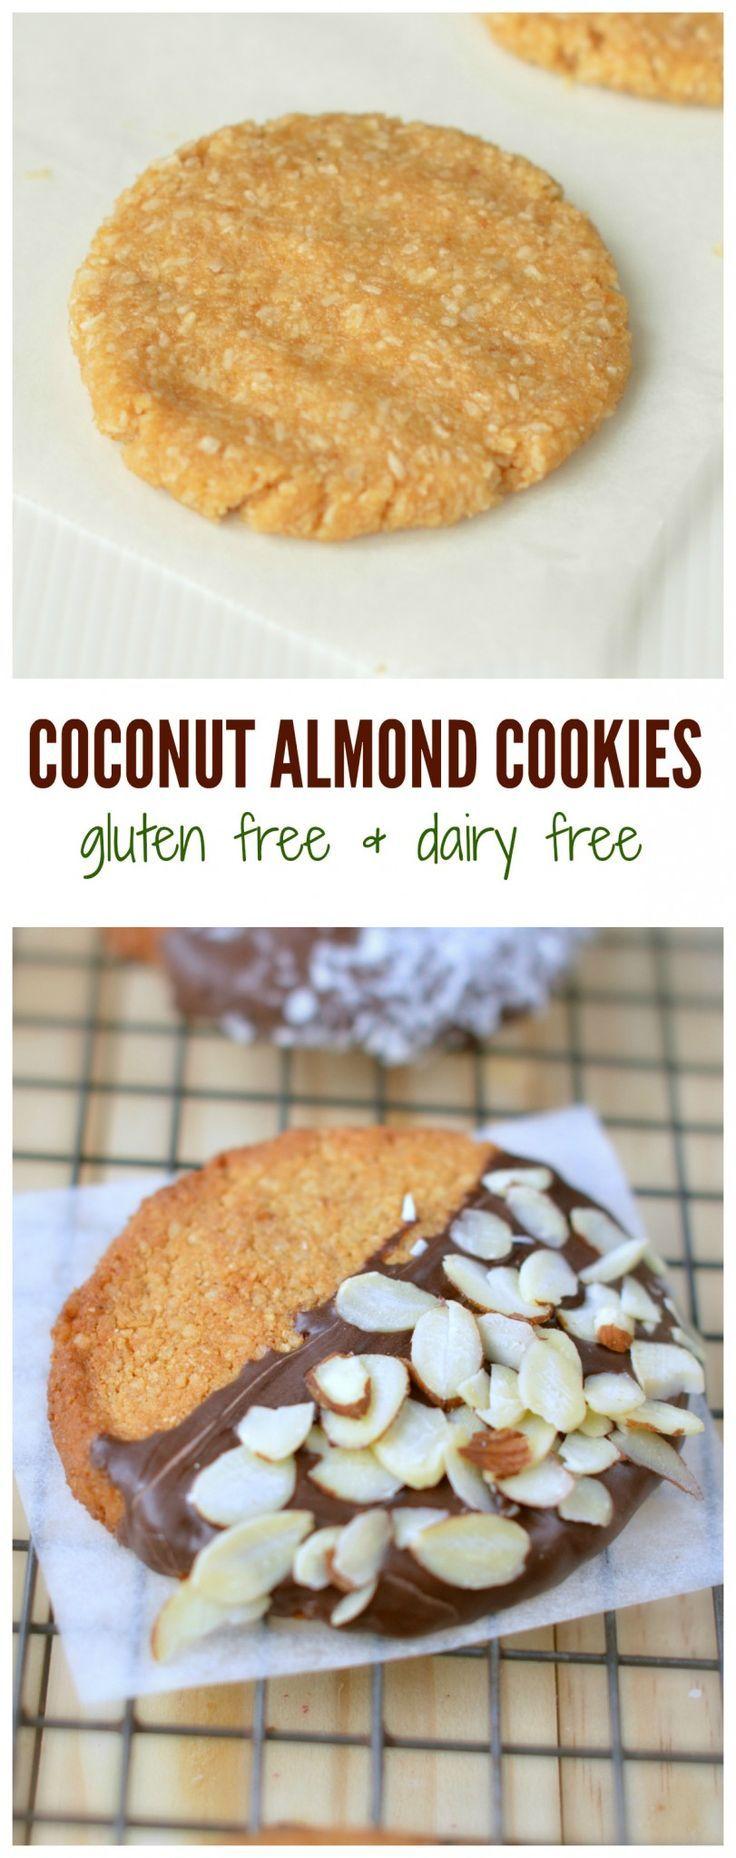 Easy + healthy + delicious cookie recipe in 15 minutes ...